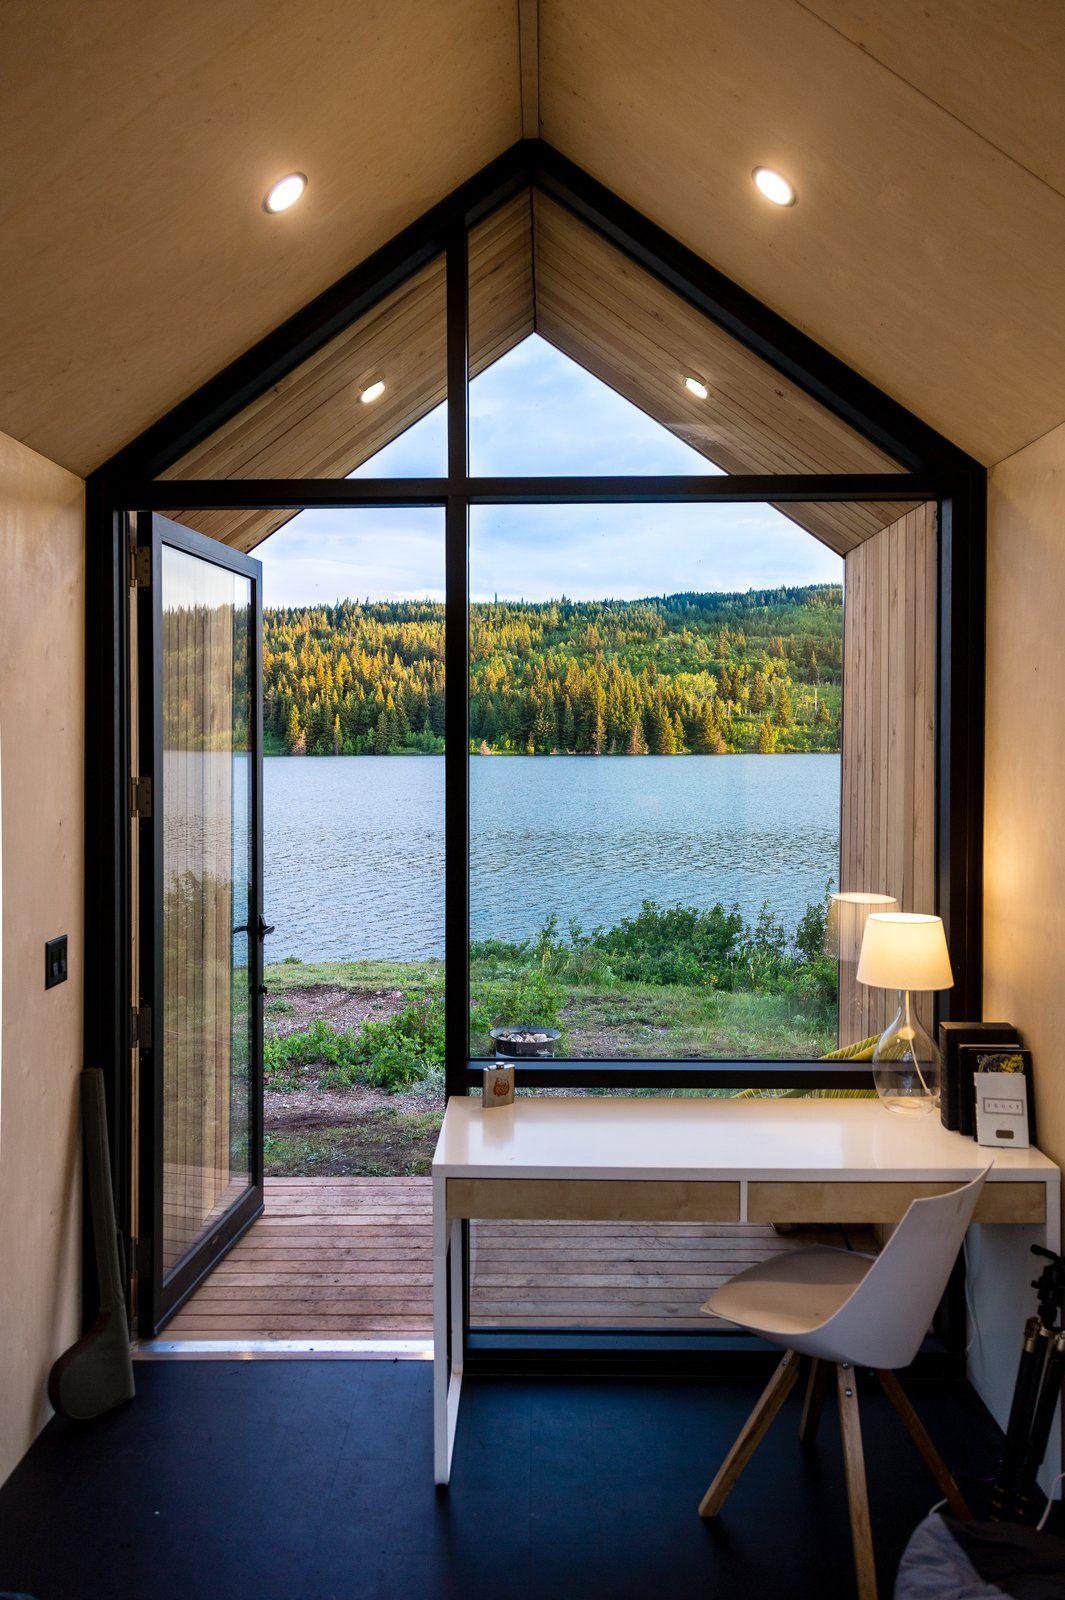 Desk next to window overlooking lake